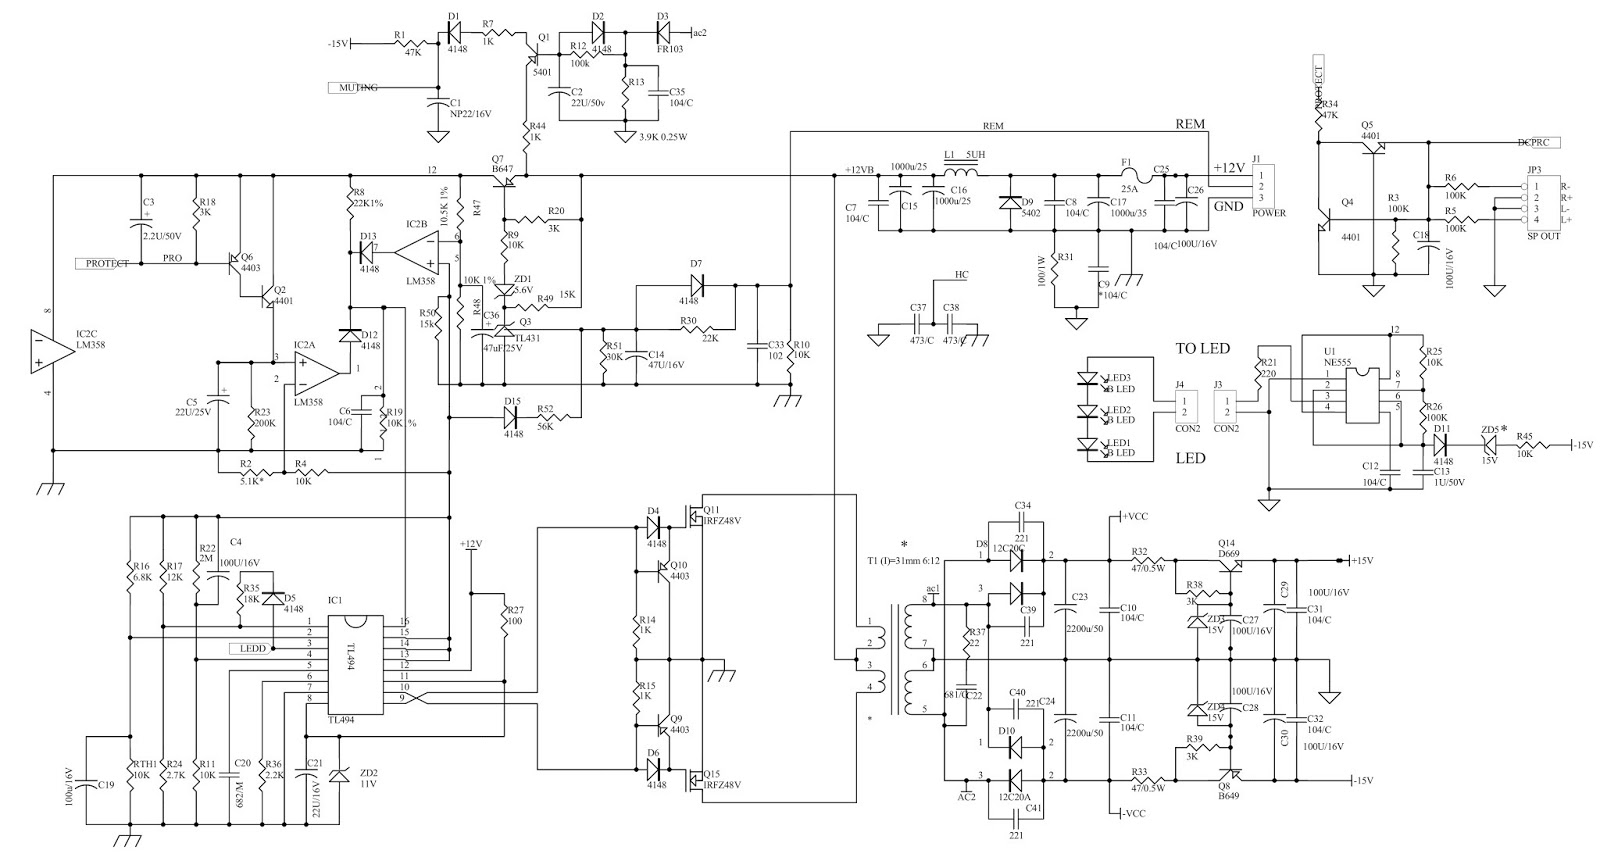 small resolution of harley davidson speaker wiring diagrams free download wiring diagram